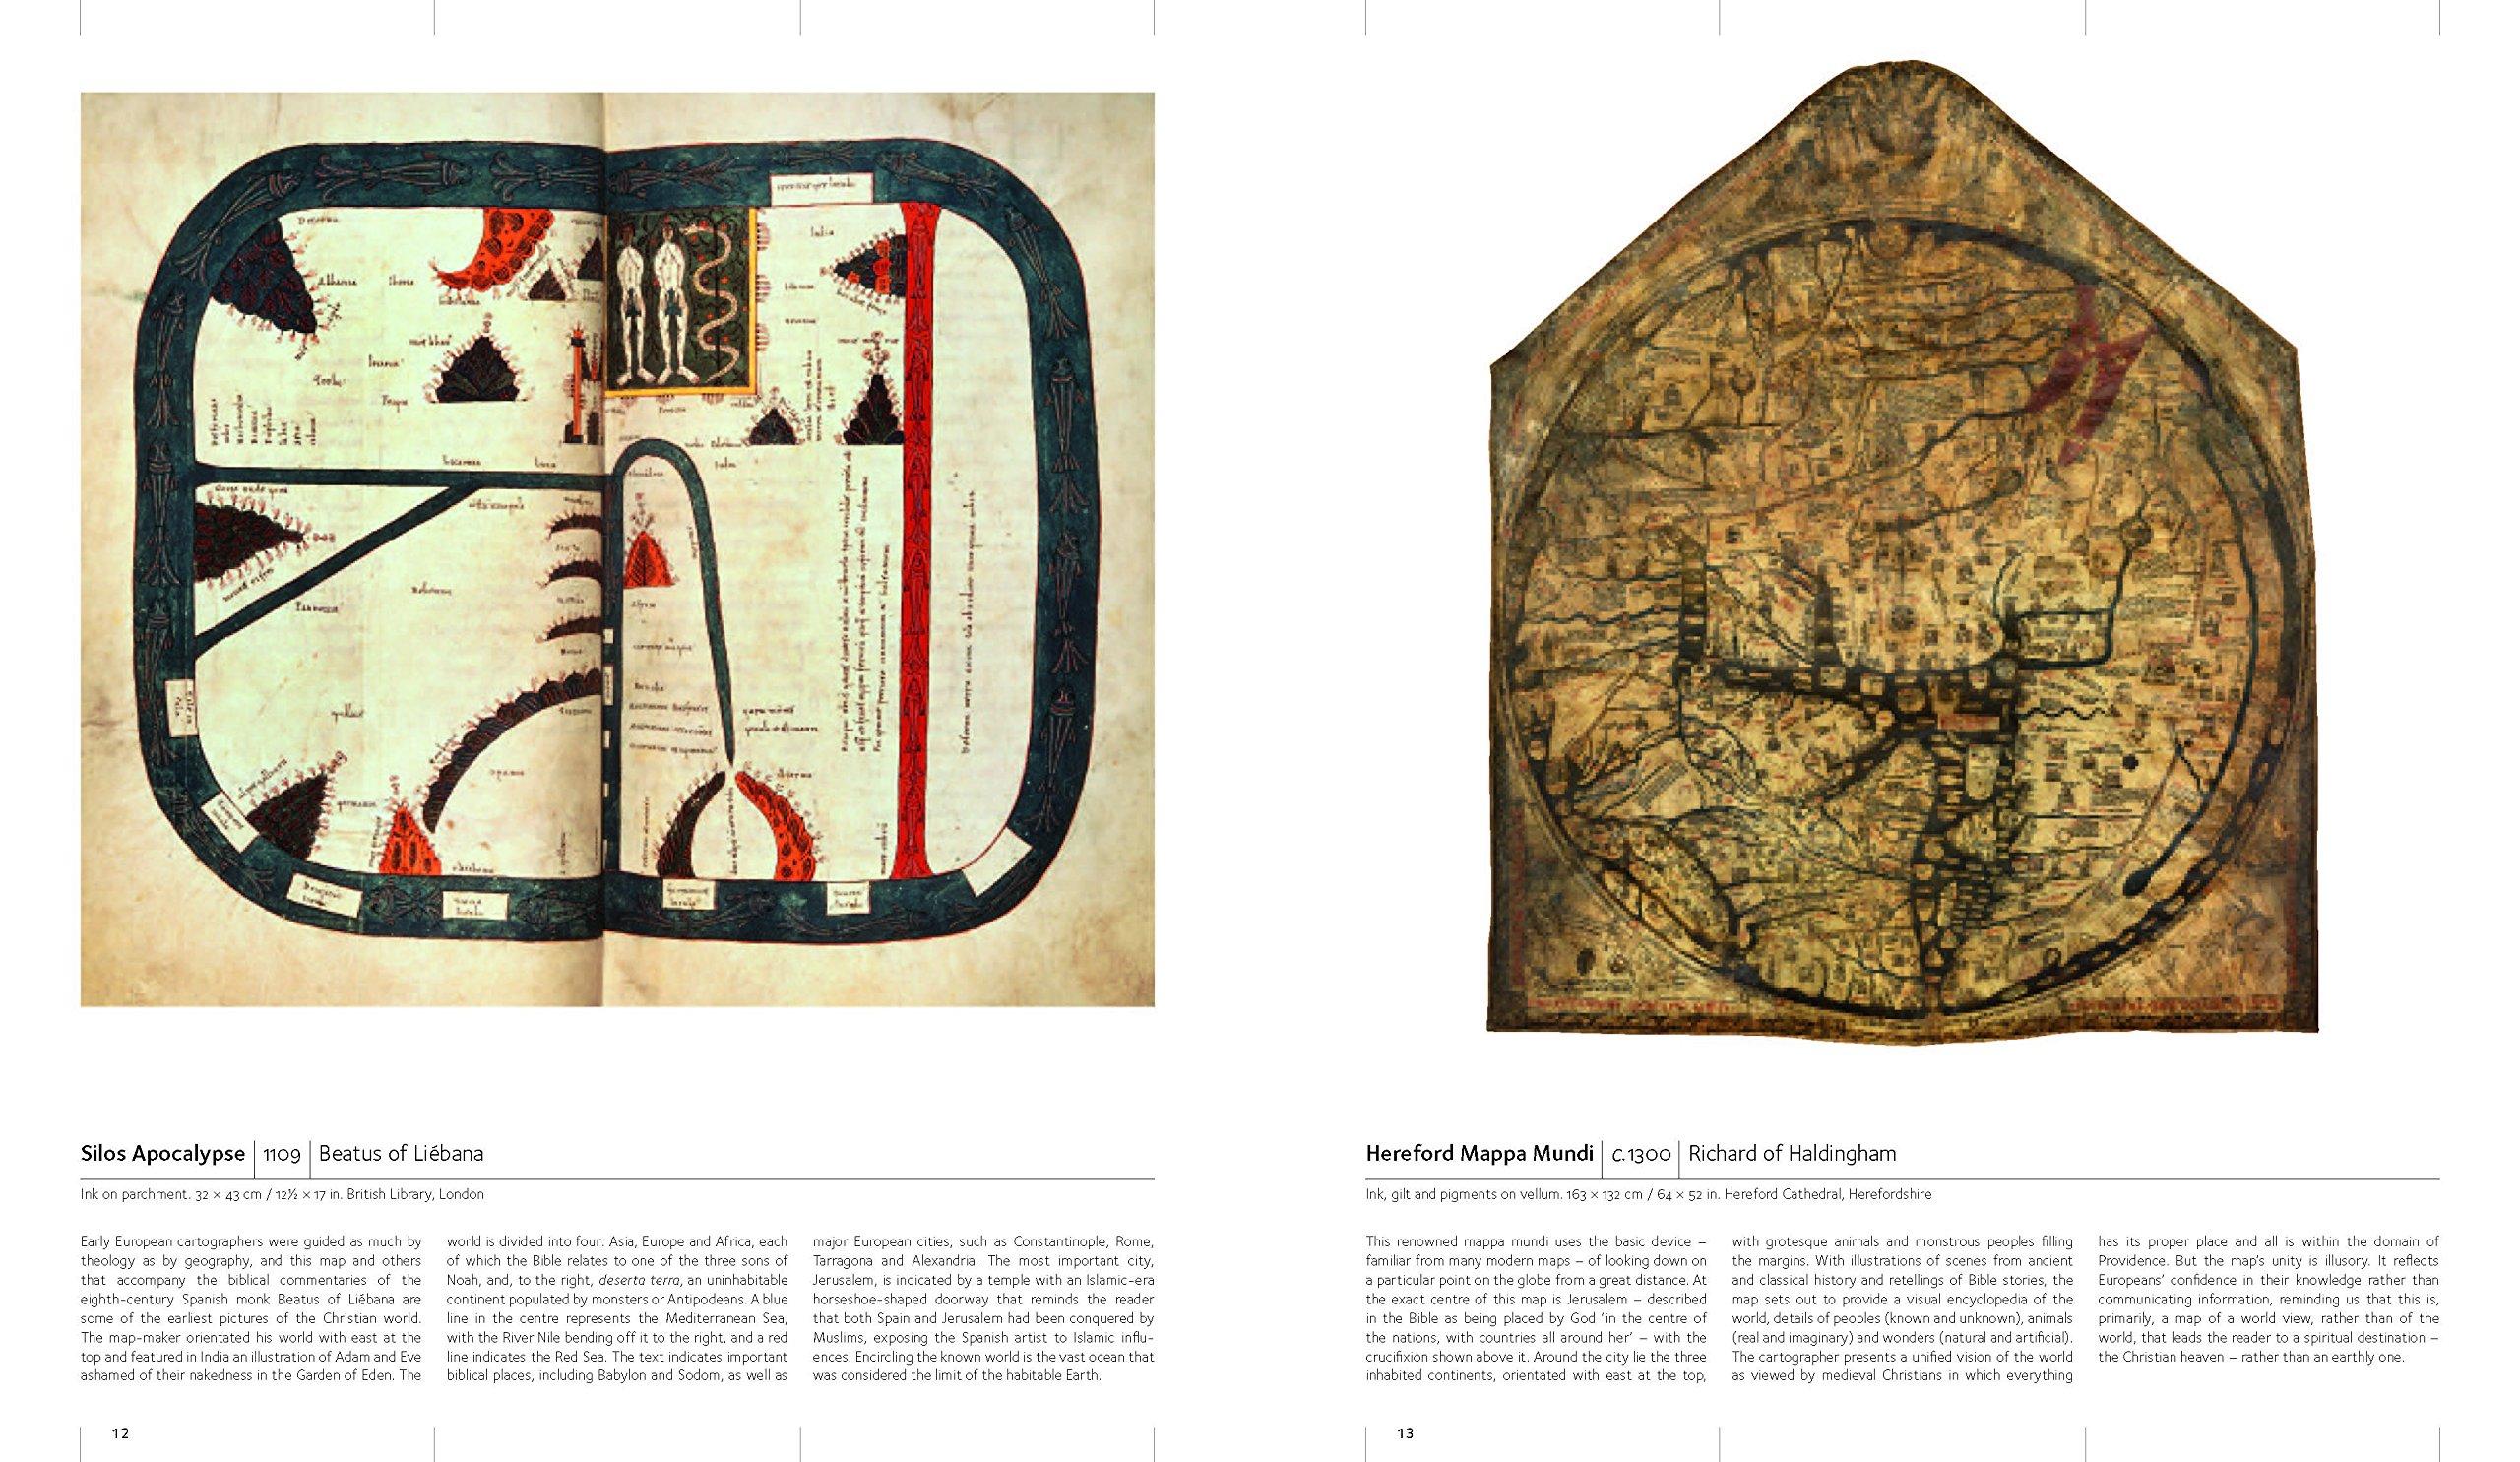 Map exploring the world phaidon editors john hessler map exploring the world phaidon editors john hessler 9780714869445 amazon books gumiabroncs Images